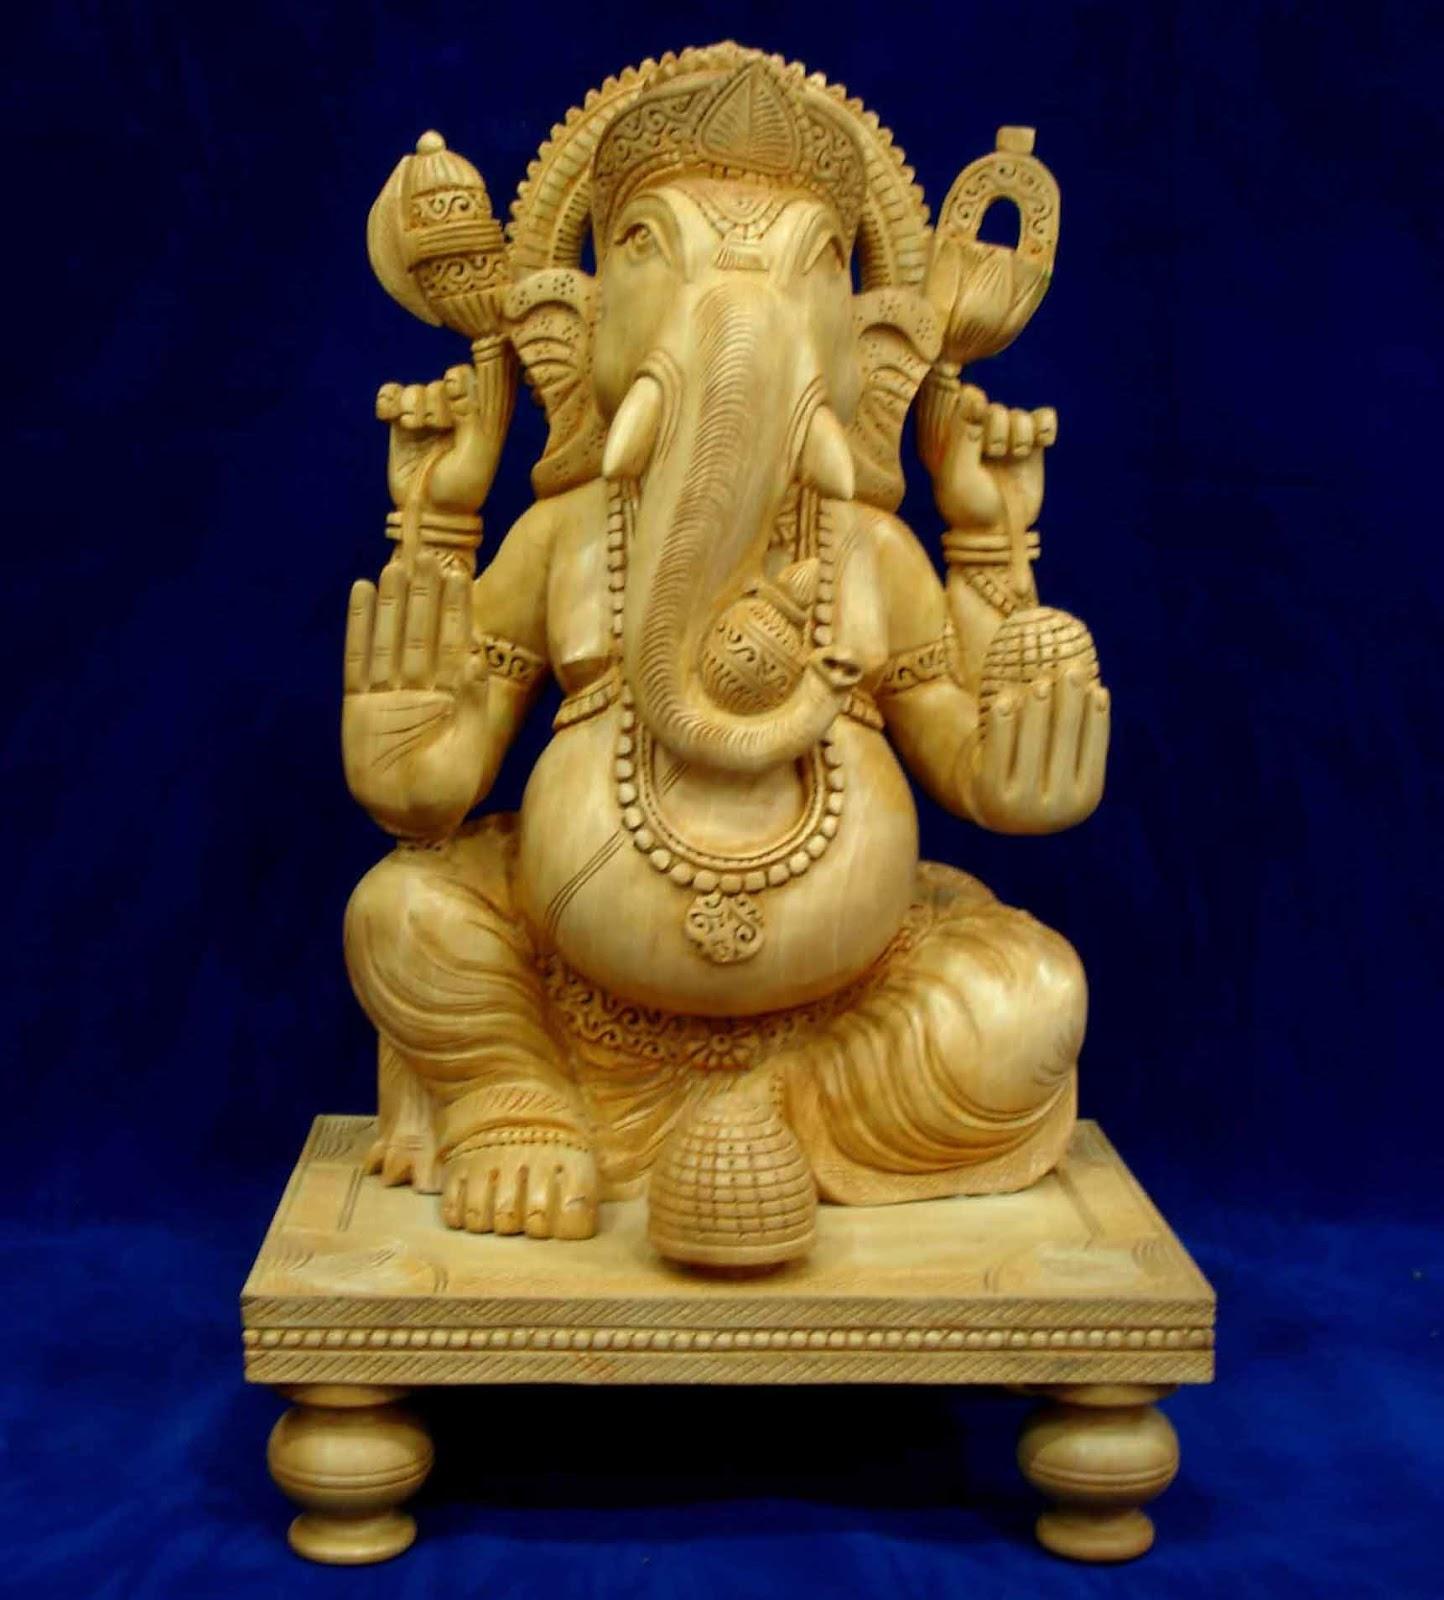 Hd wallpaper download hd wallpaper ganesh chturthi wallpaper 1444x1600